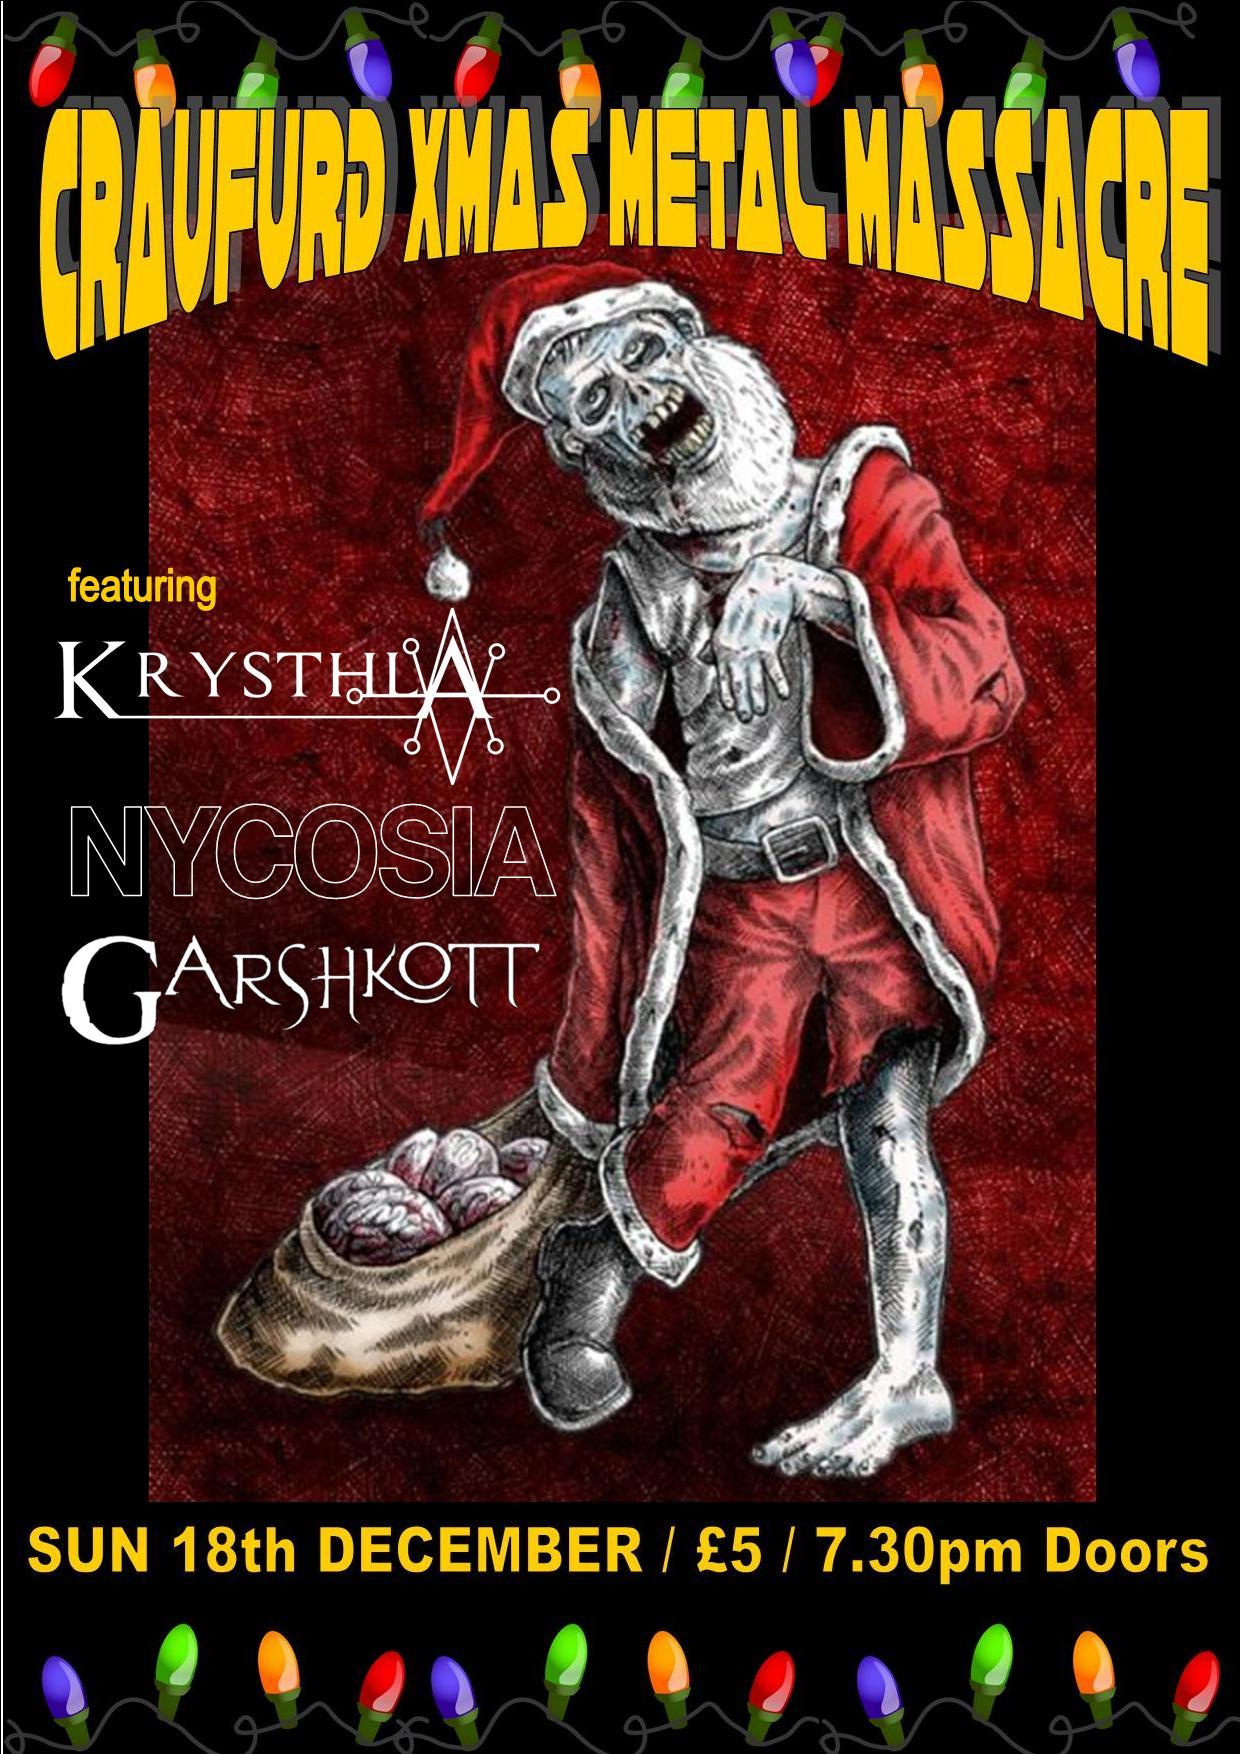 Craufurd Christmas Metal Massacre